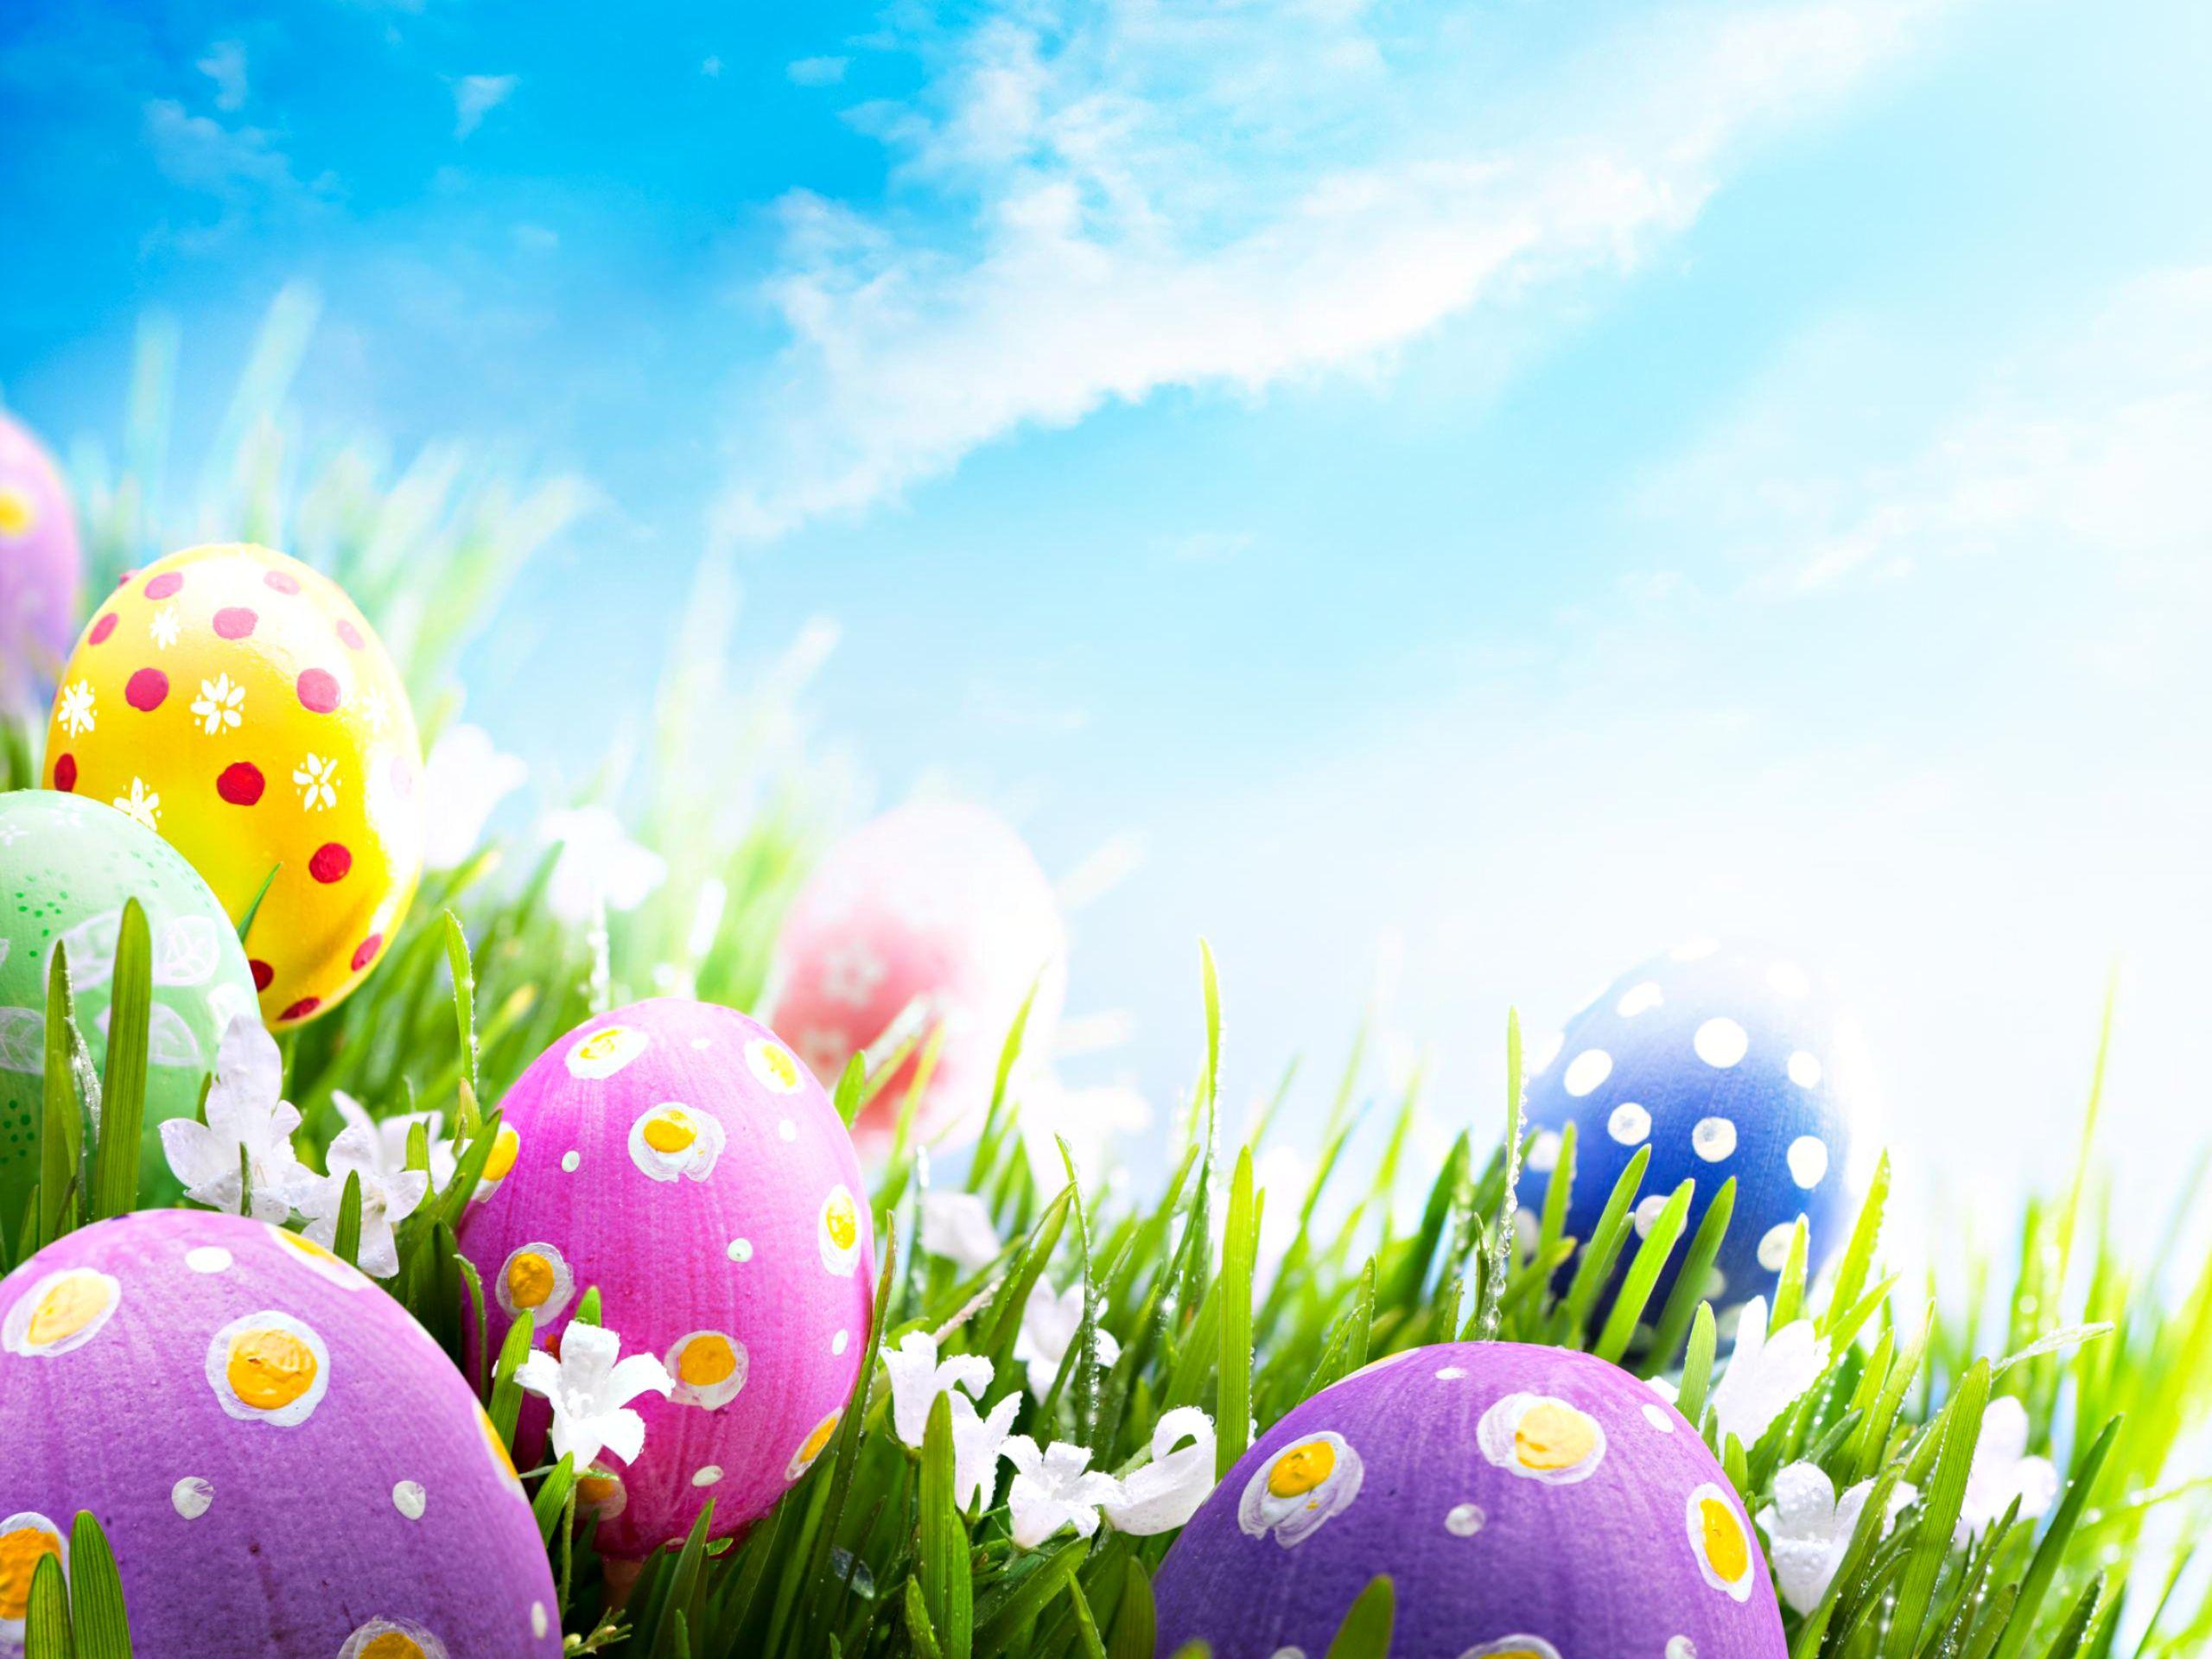 Happy Easter easter Easter wallpaper Happy easter wallpaper 2560x1920